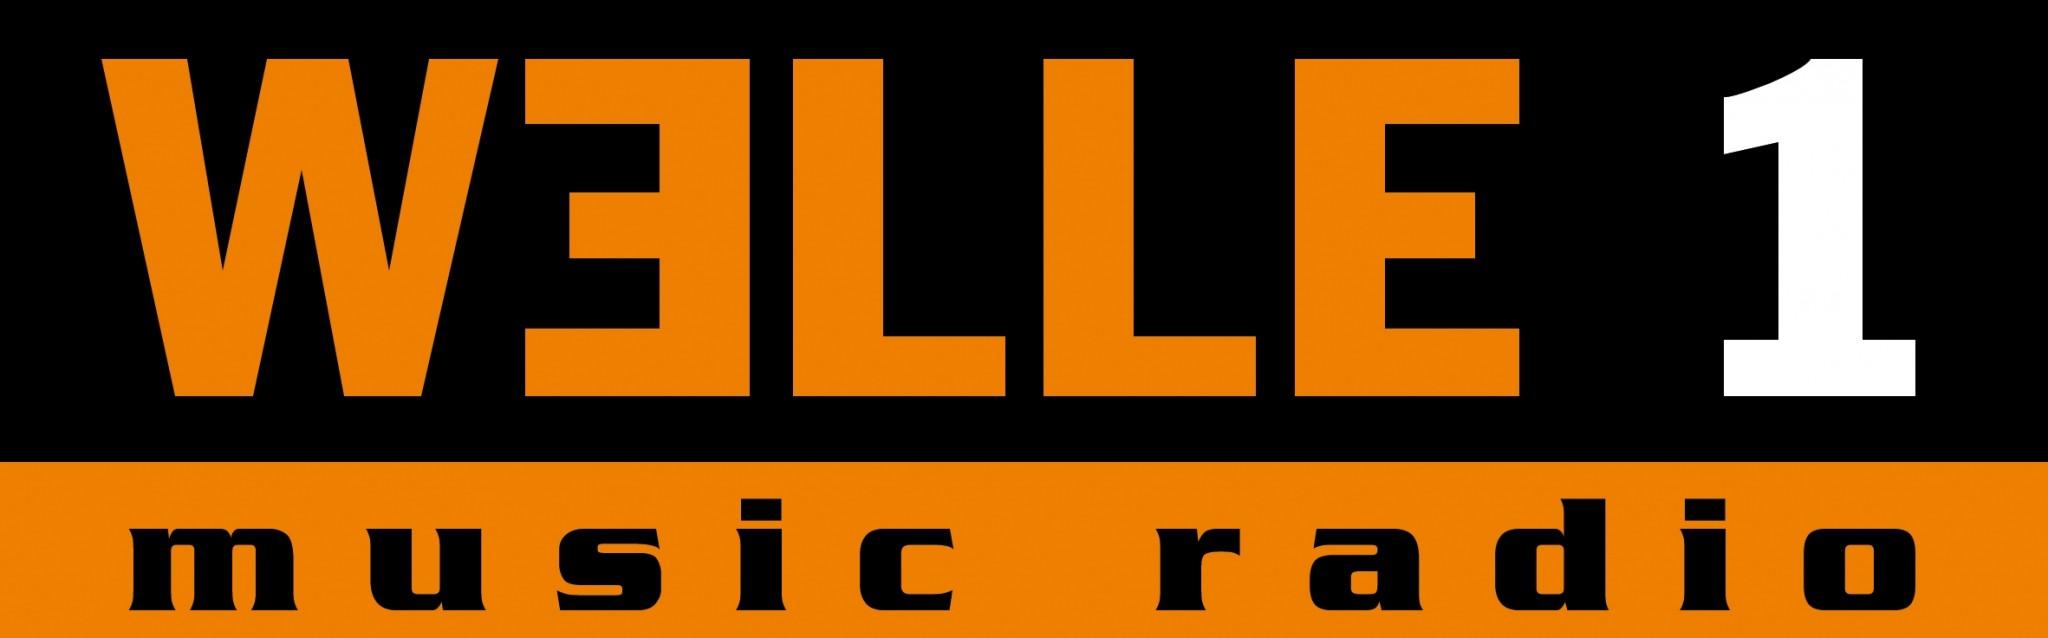 Radiosender Well1